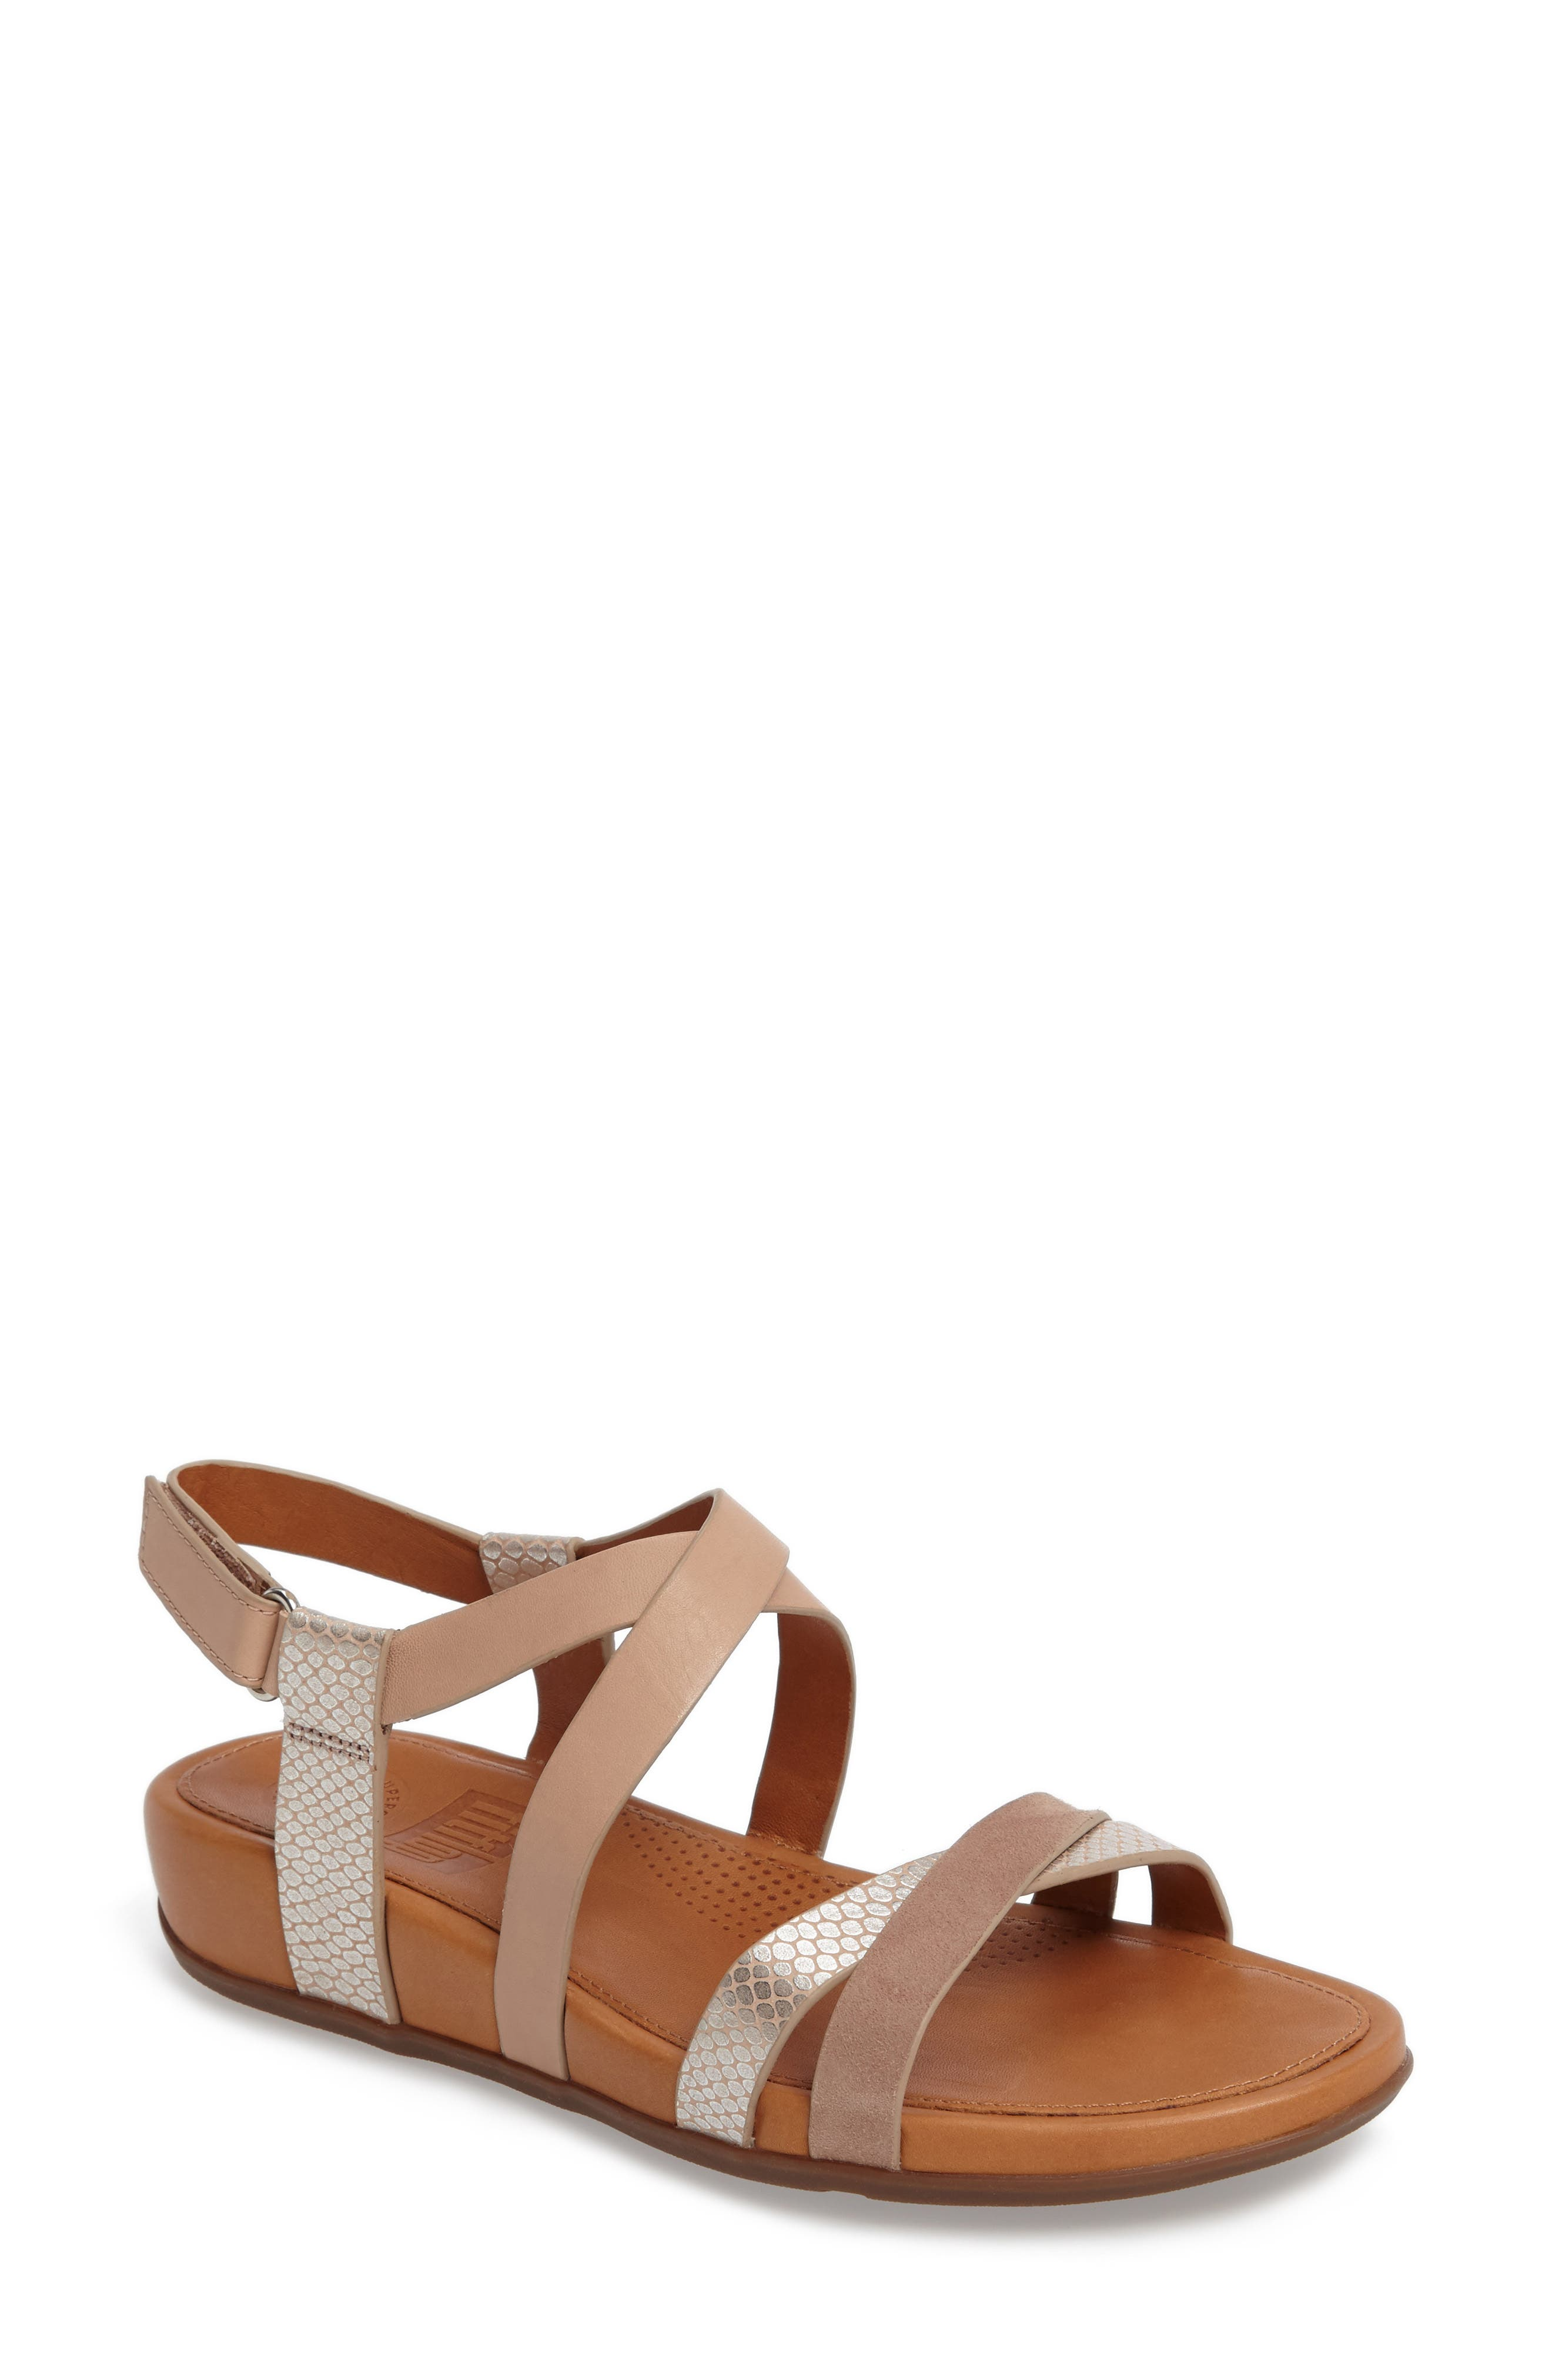 Alternate Image 1 Selected - FitFlop Lumy Crisscross Sandal (Women)